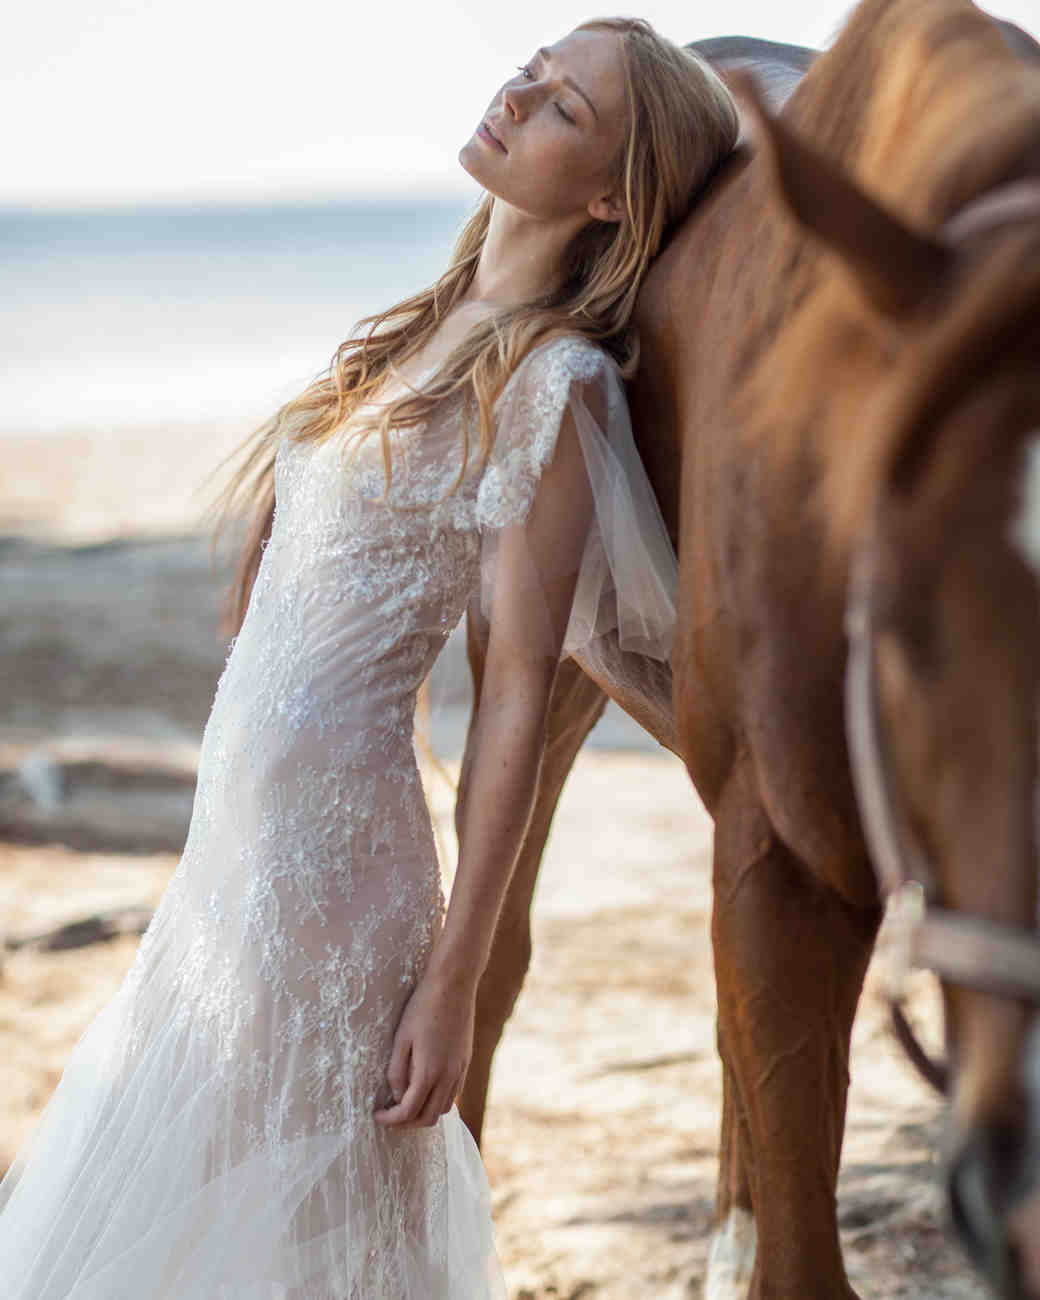 costarellos-fall2016-wedding-dress-16-37.jpg